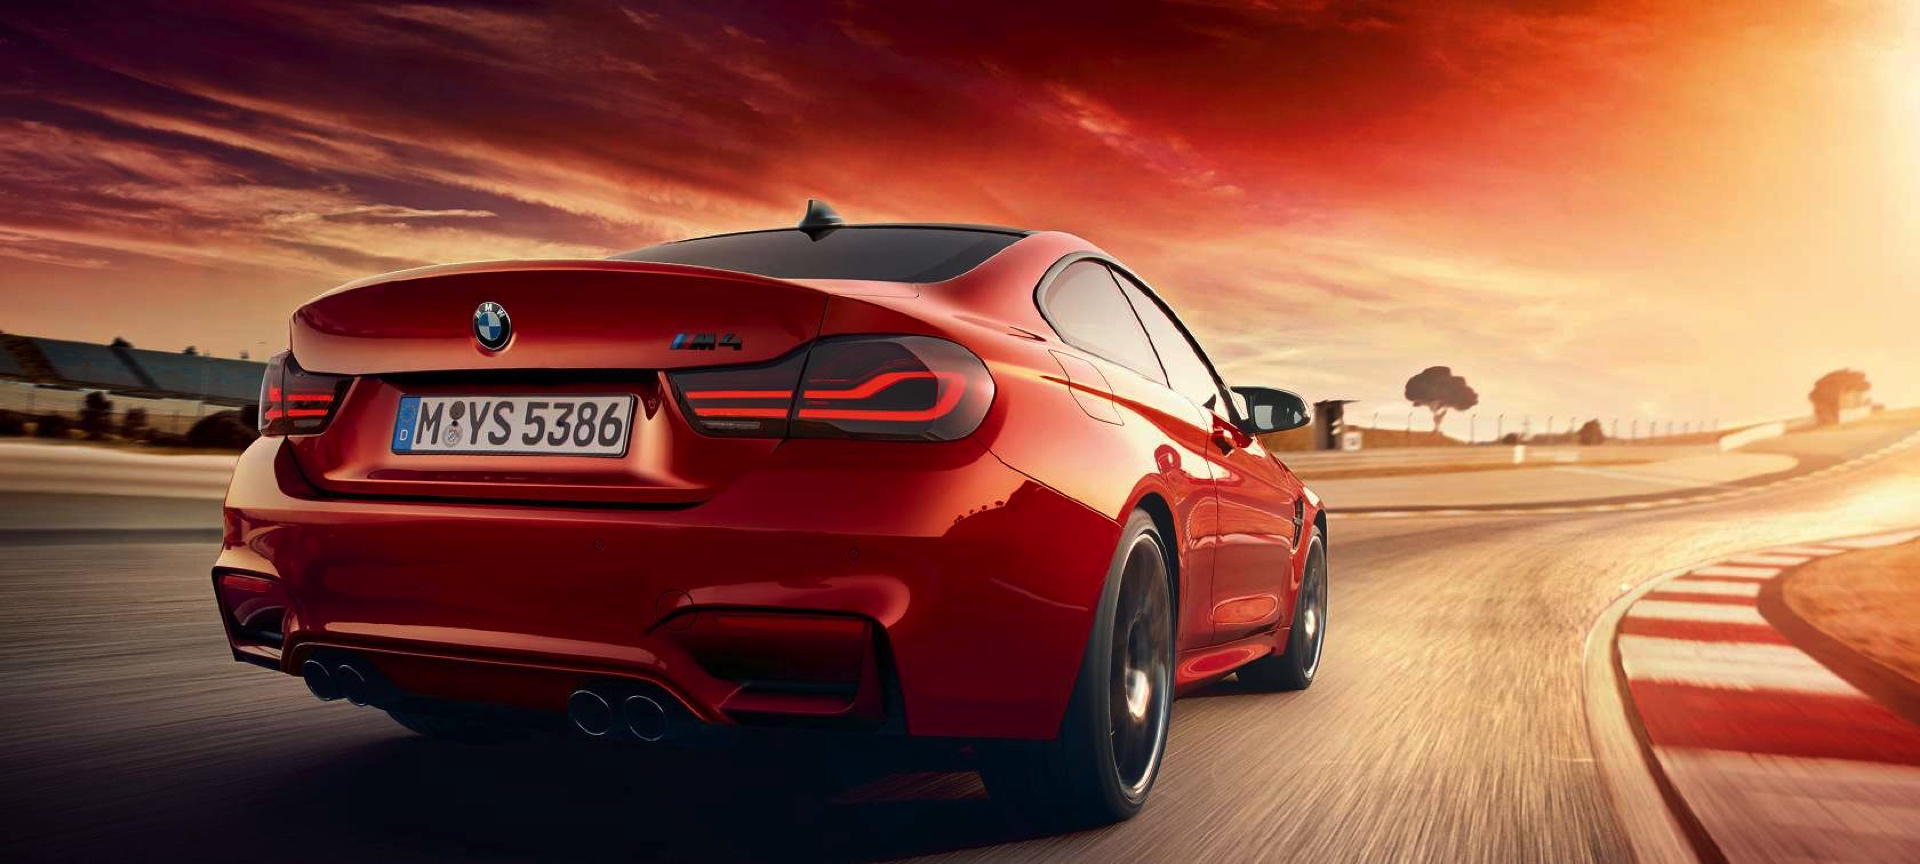 Name:  2019-BMW-M4-Facelift-Dark-Tail-Lights-2.jpg Views: 4080 Size:  384.7 KB